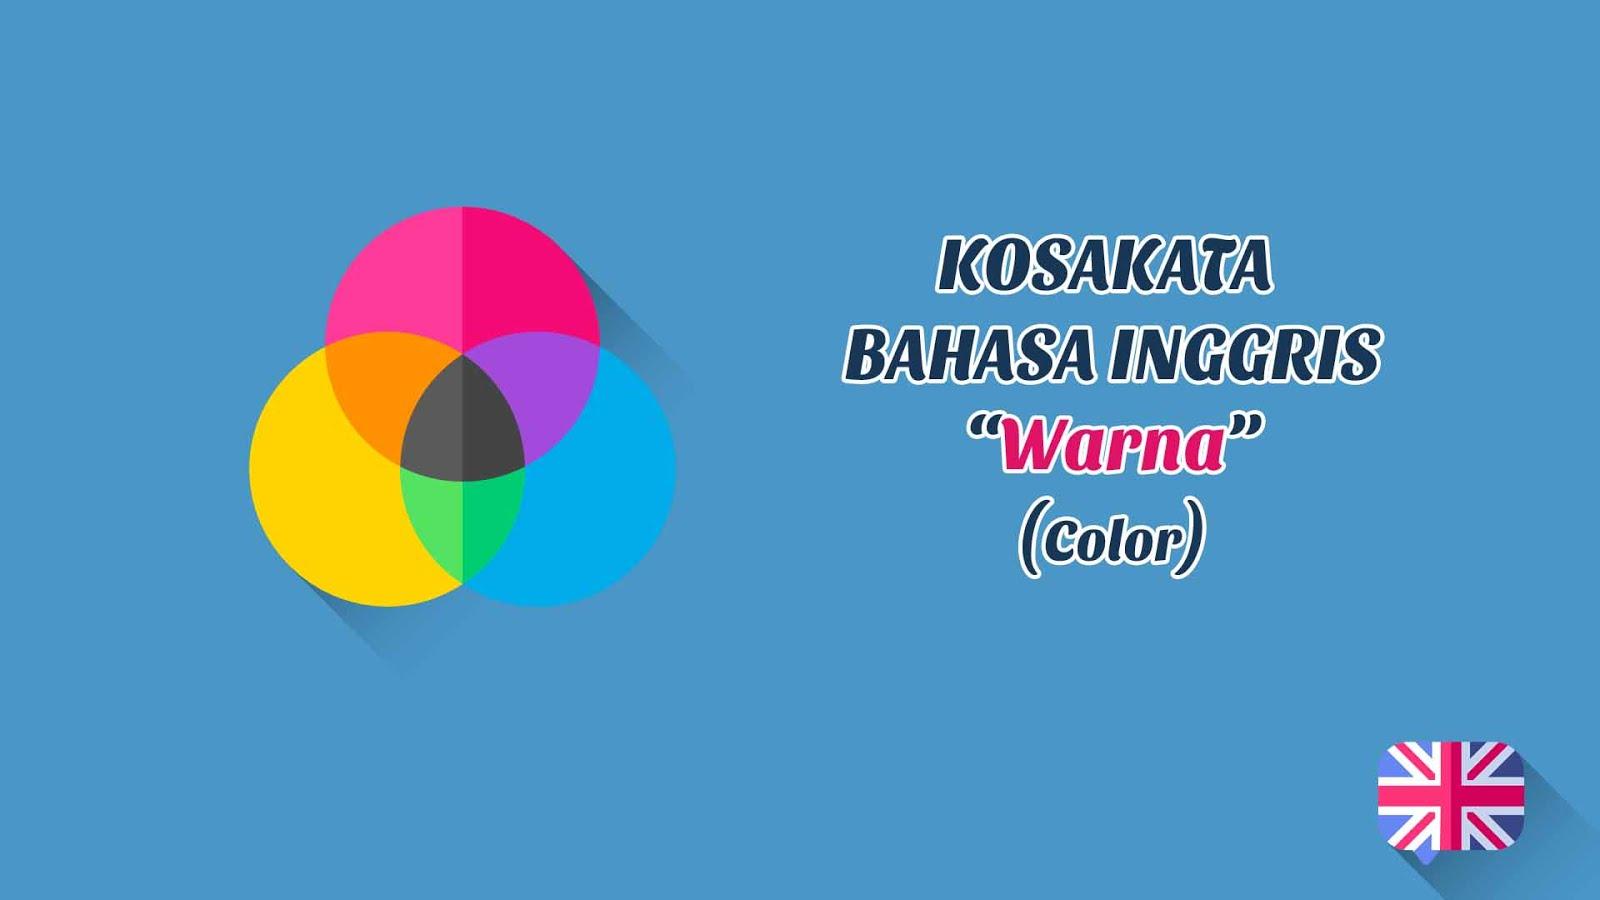 Macam-Macam Warna (Color) + Pronunciation (Kosakata Bahasa Inggris)